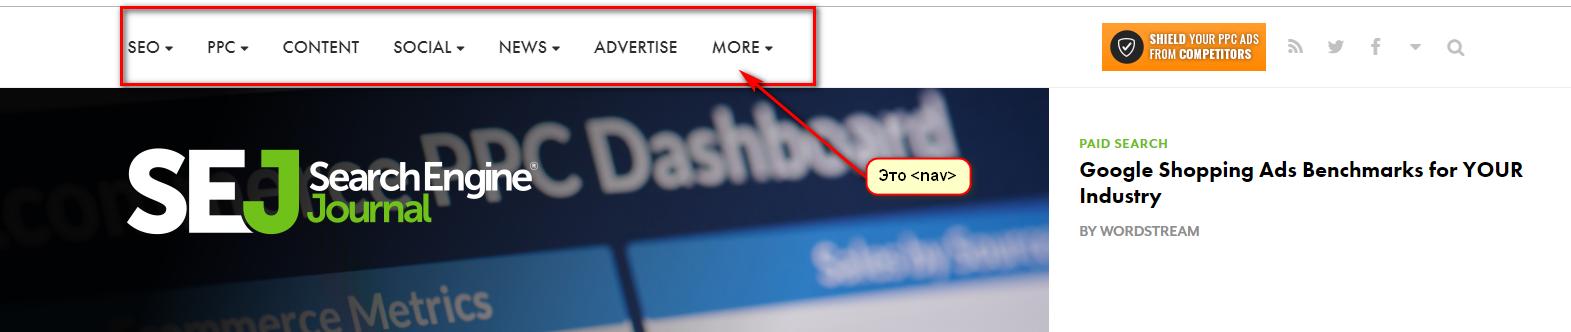 Разметка html5 nav в header